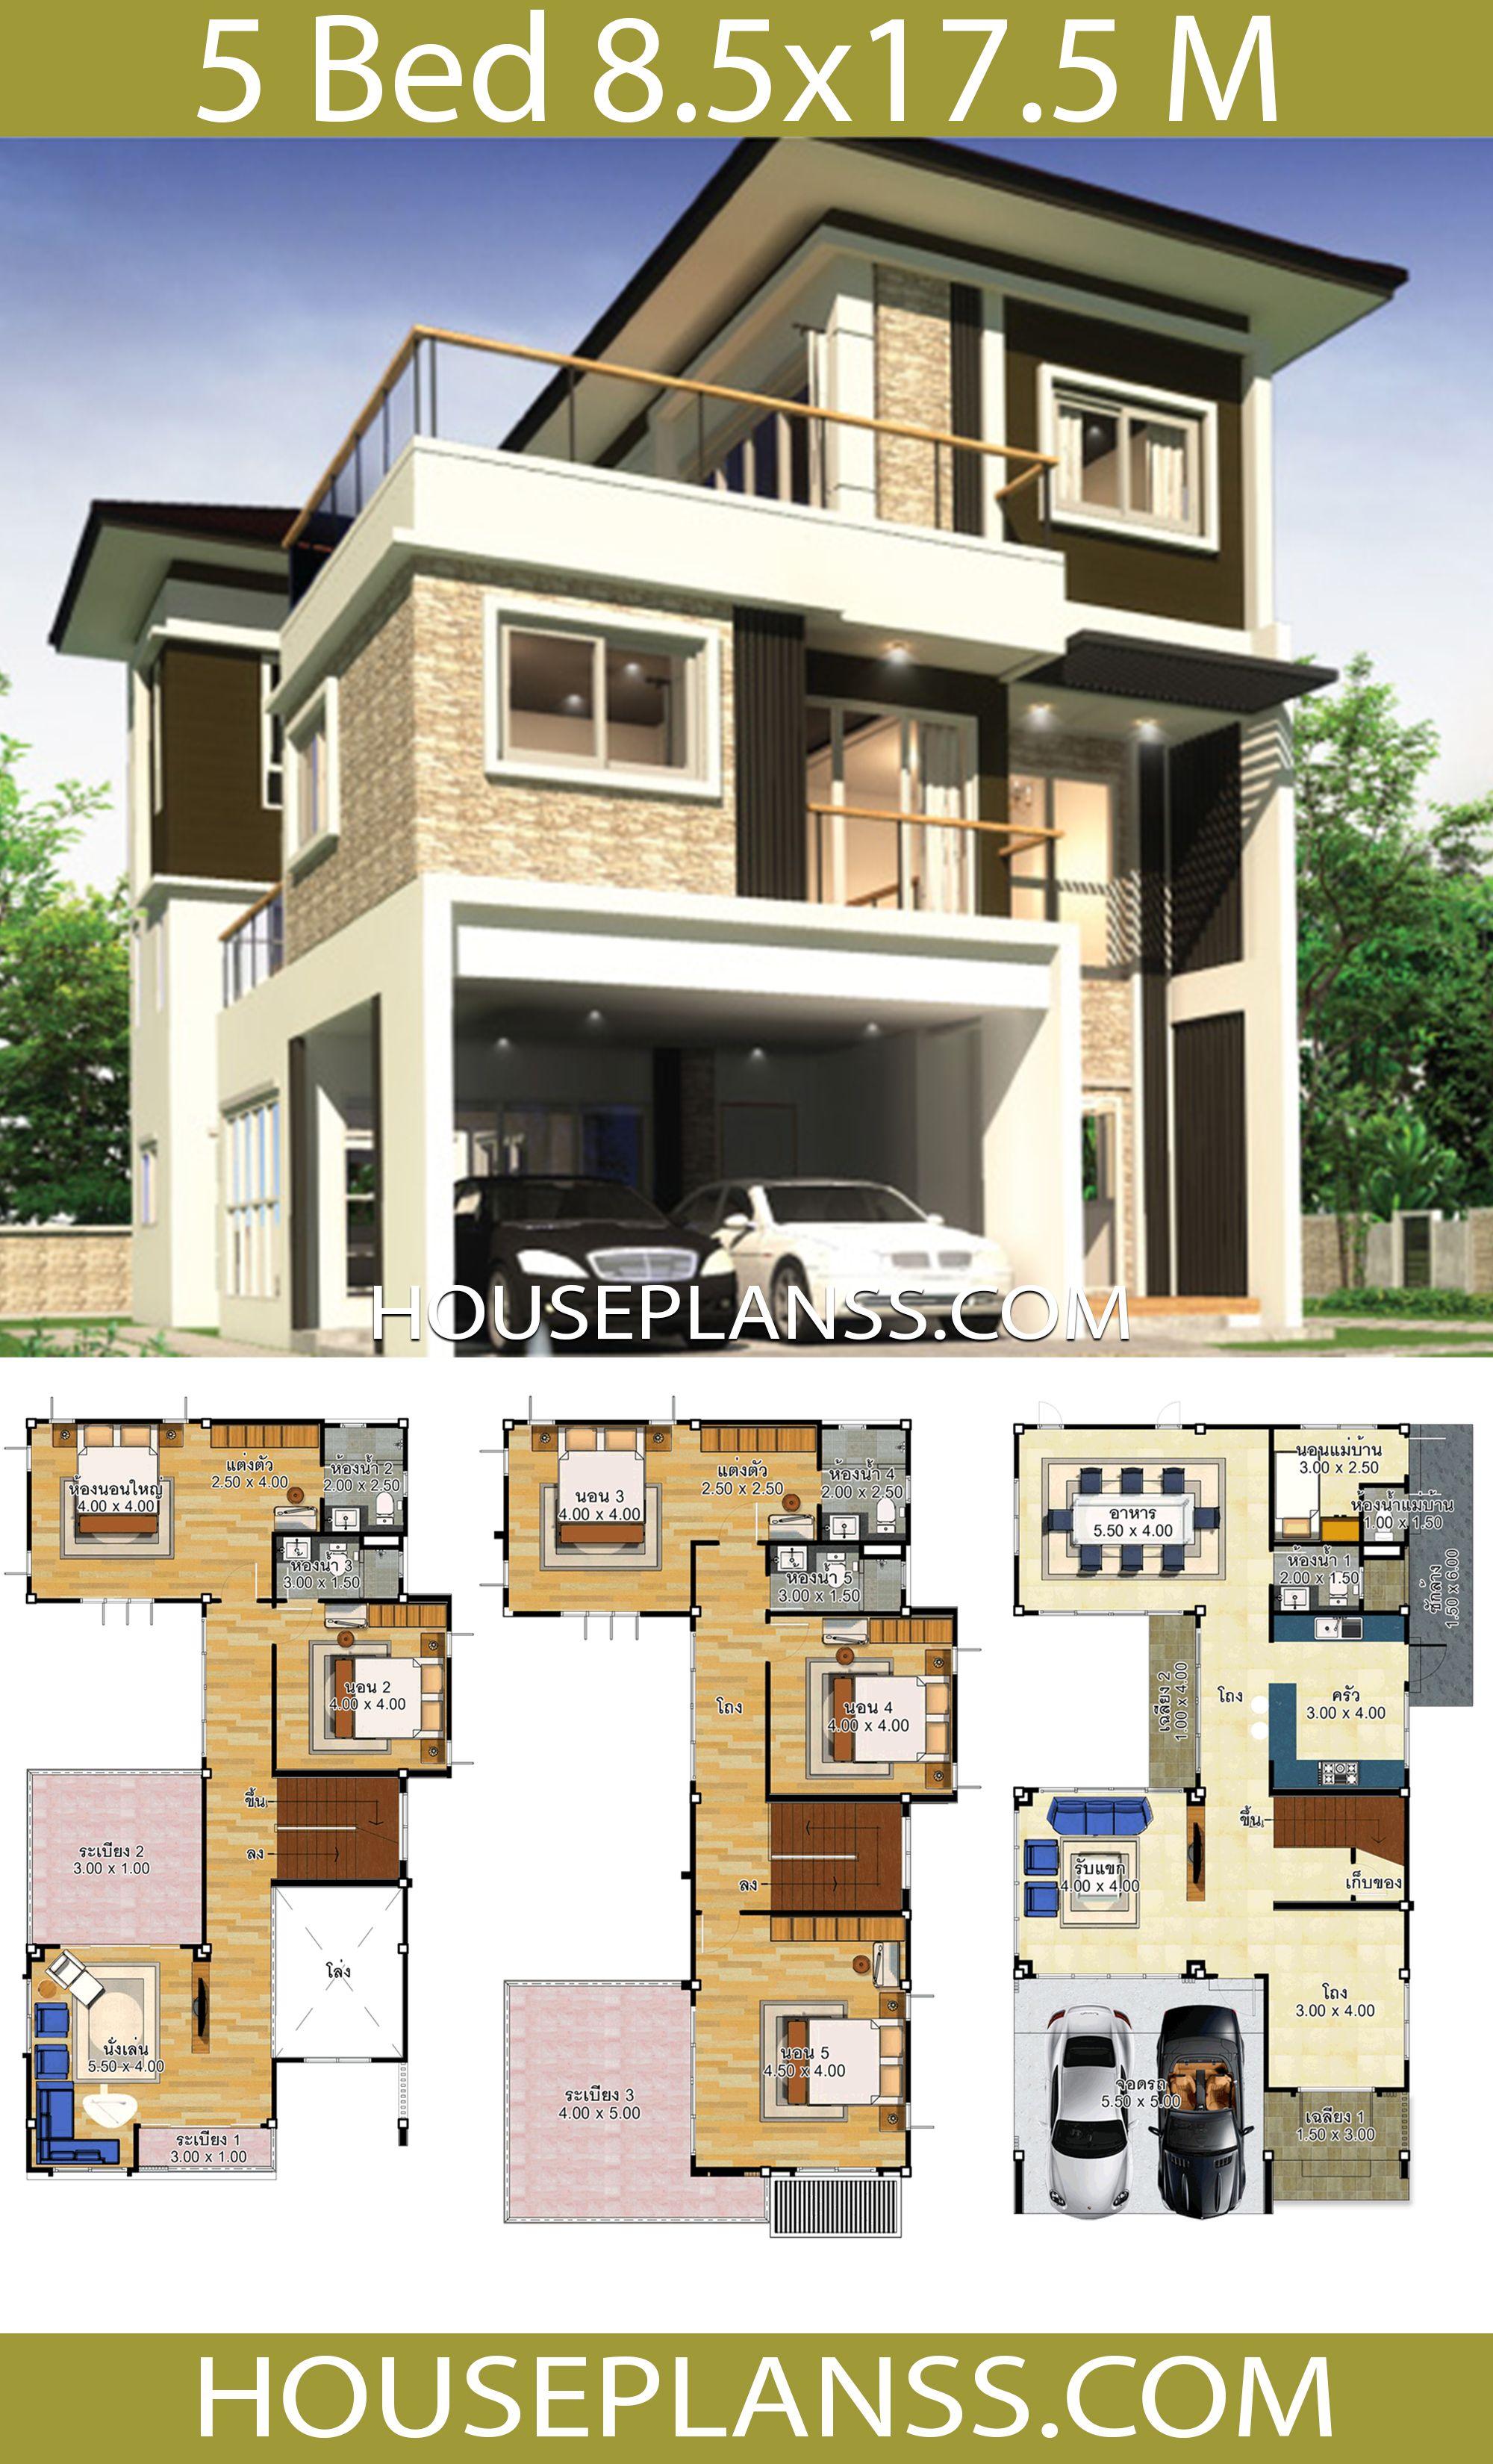 House Design Idea 8 5x17 5 With 5 Bedrooms House Plans 3d Contemporary House Plans Two Story House Design 3d House Plans